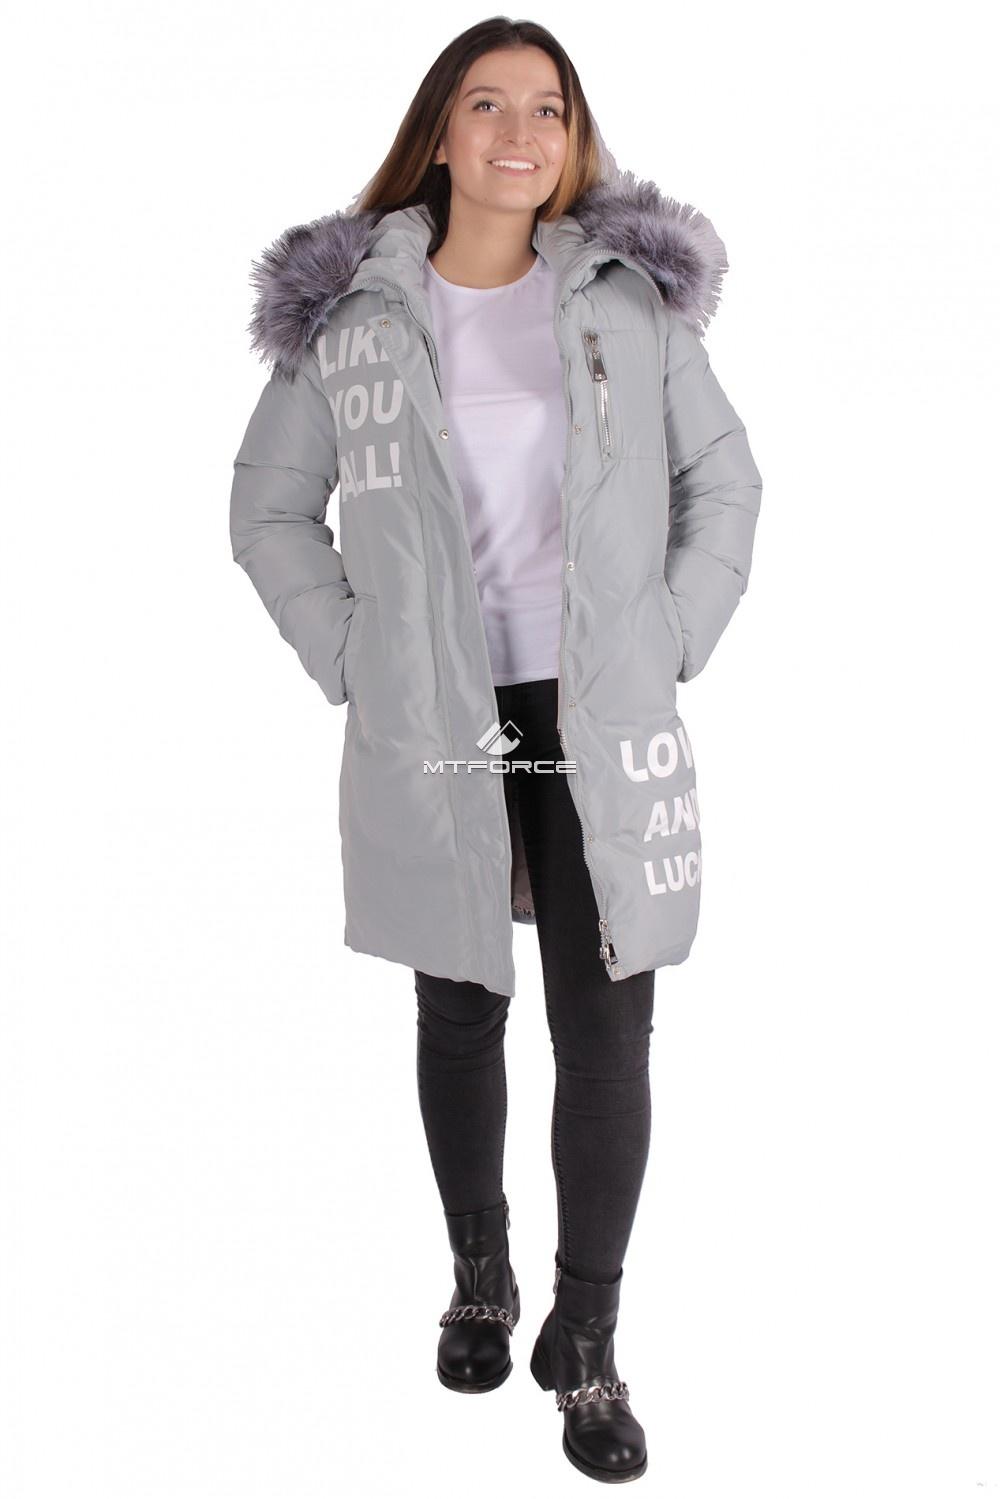 Купить                                      оптом Пуховик ТРЕНД женский зимний серого цвета 16085Sr